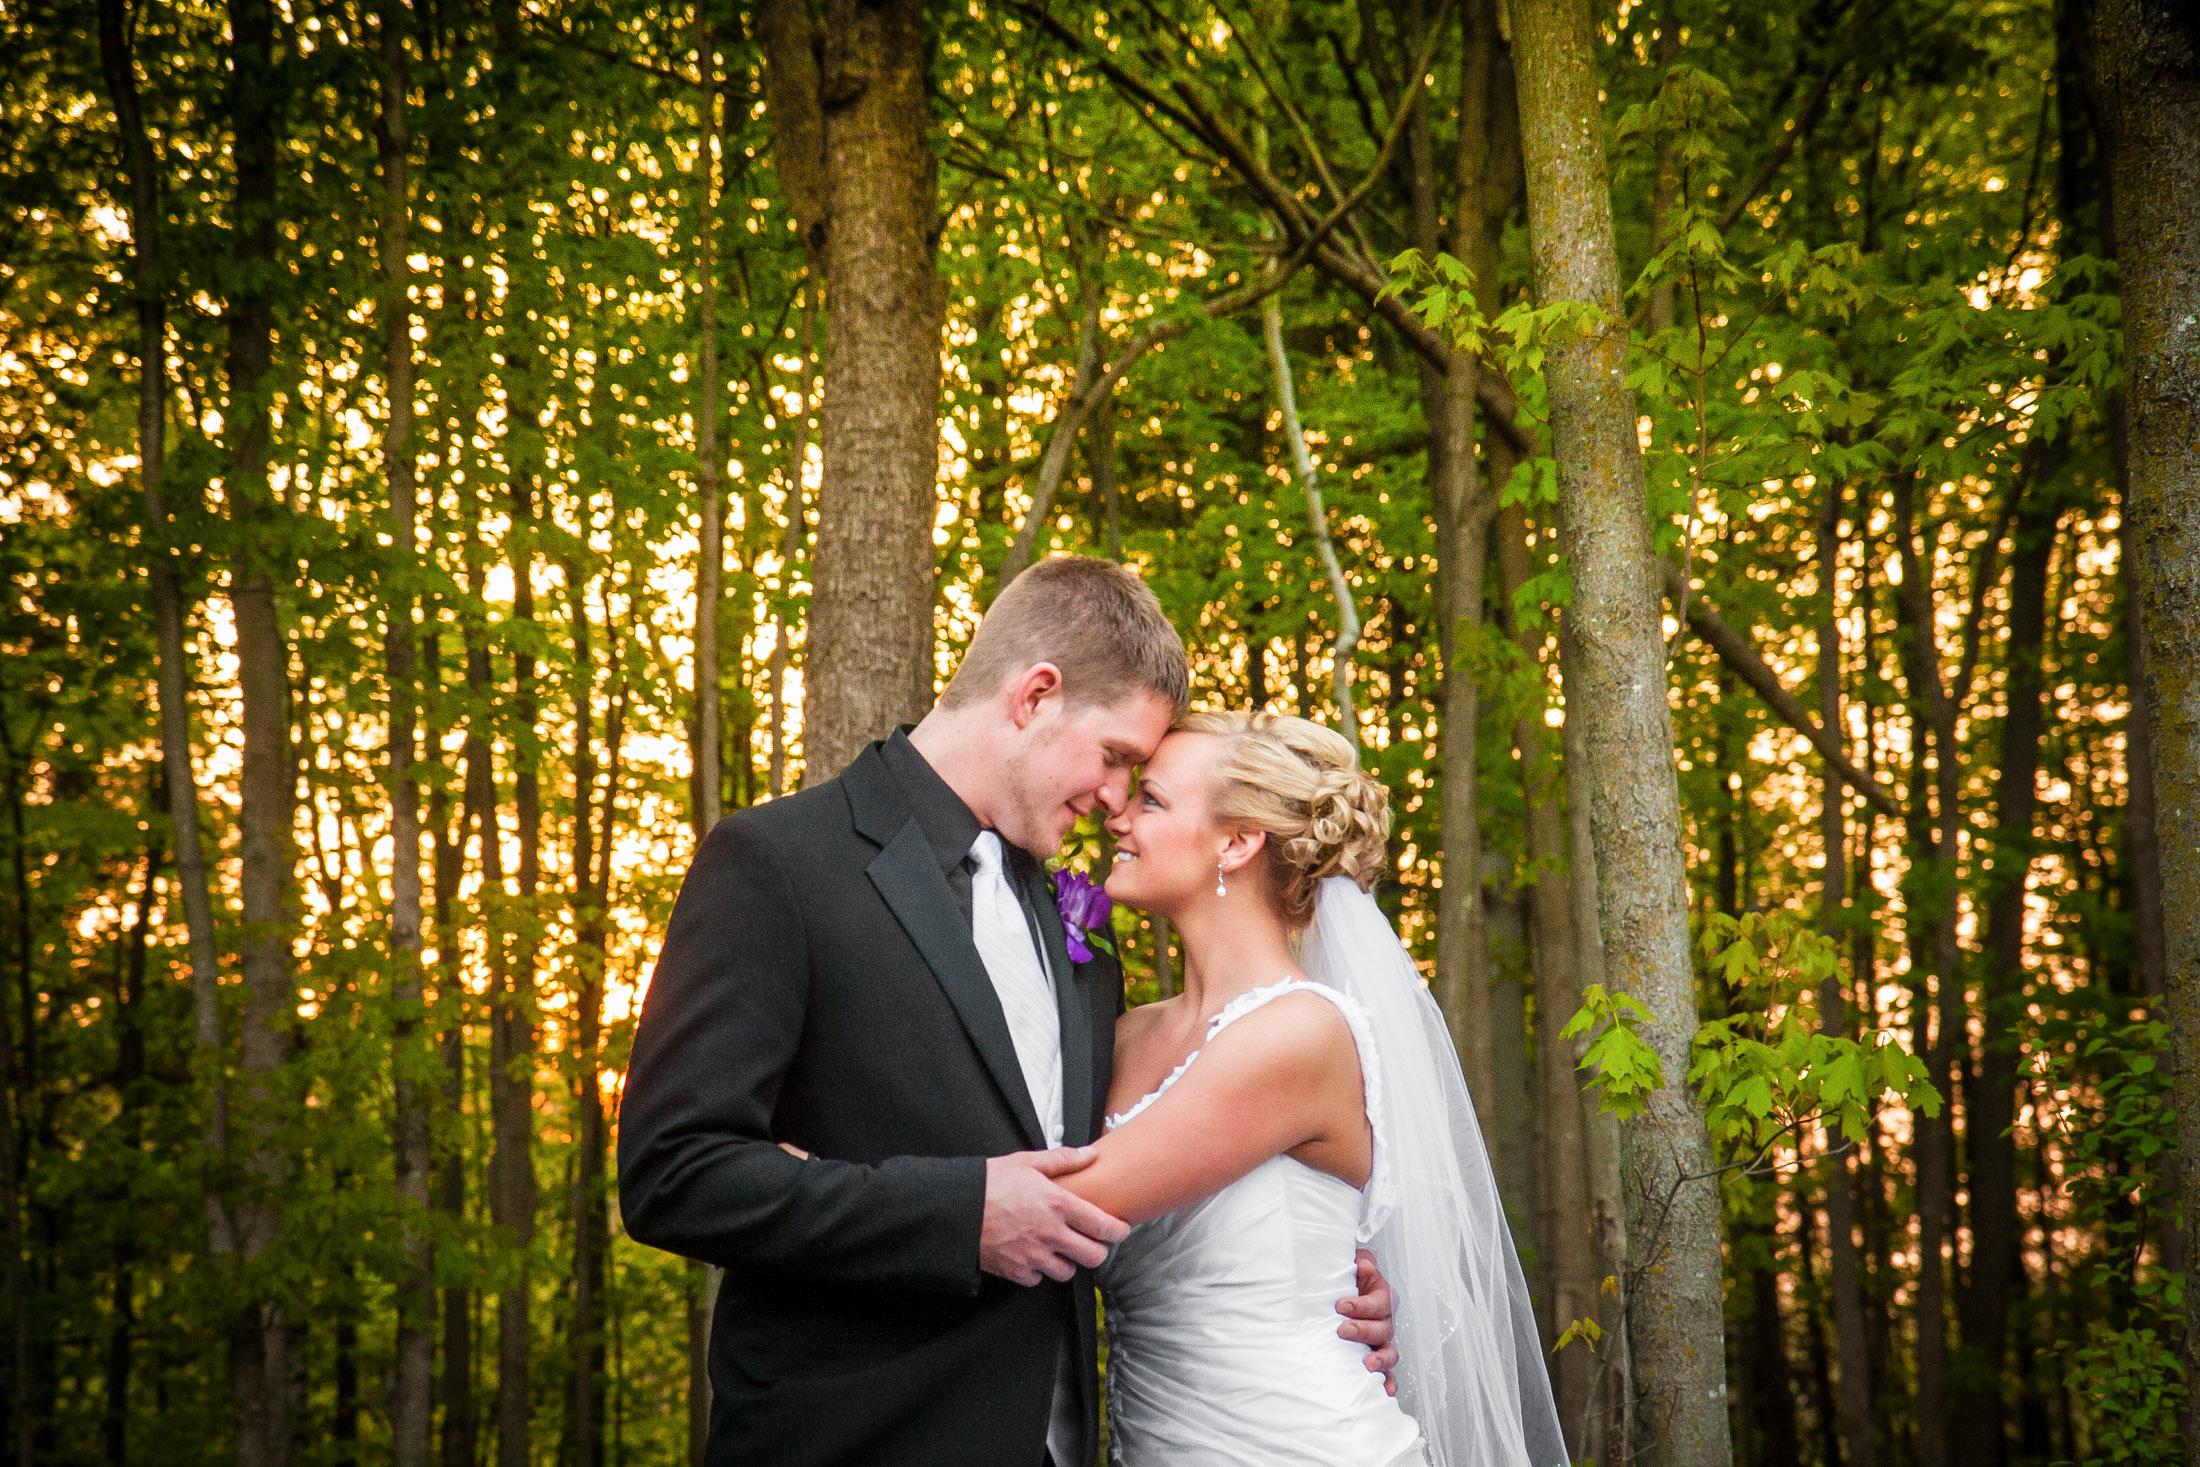 bride-groom-woods-north-woods-wedding-photographer-adam-shea-photography-green+bay-appleton-neenah-oshkosh-fond-du-lac-wisconsin-photos.jpg